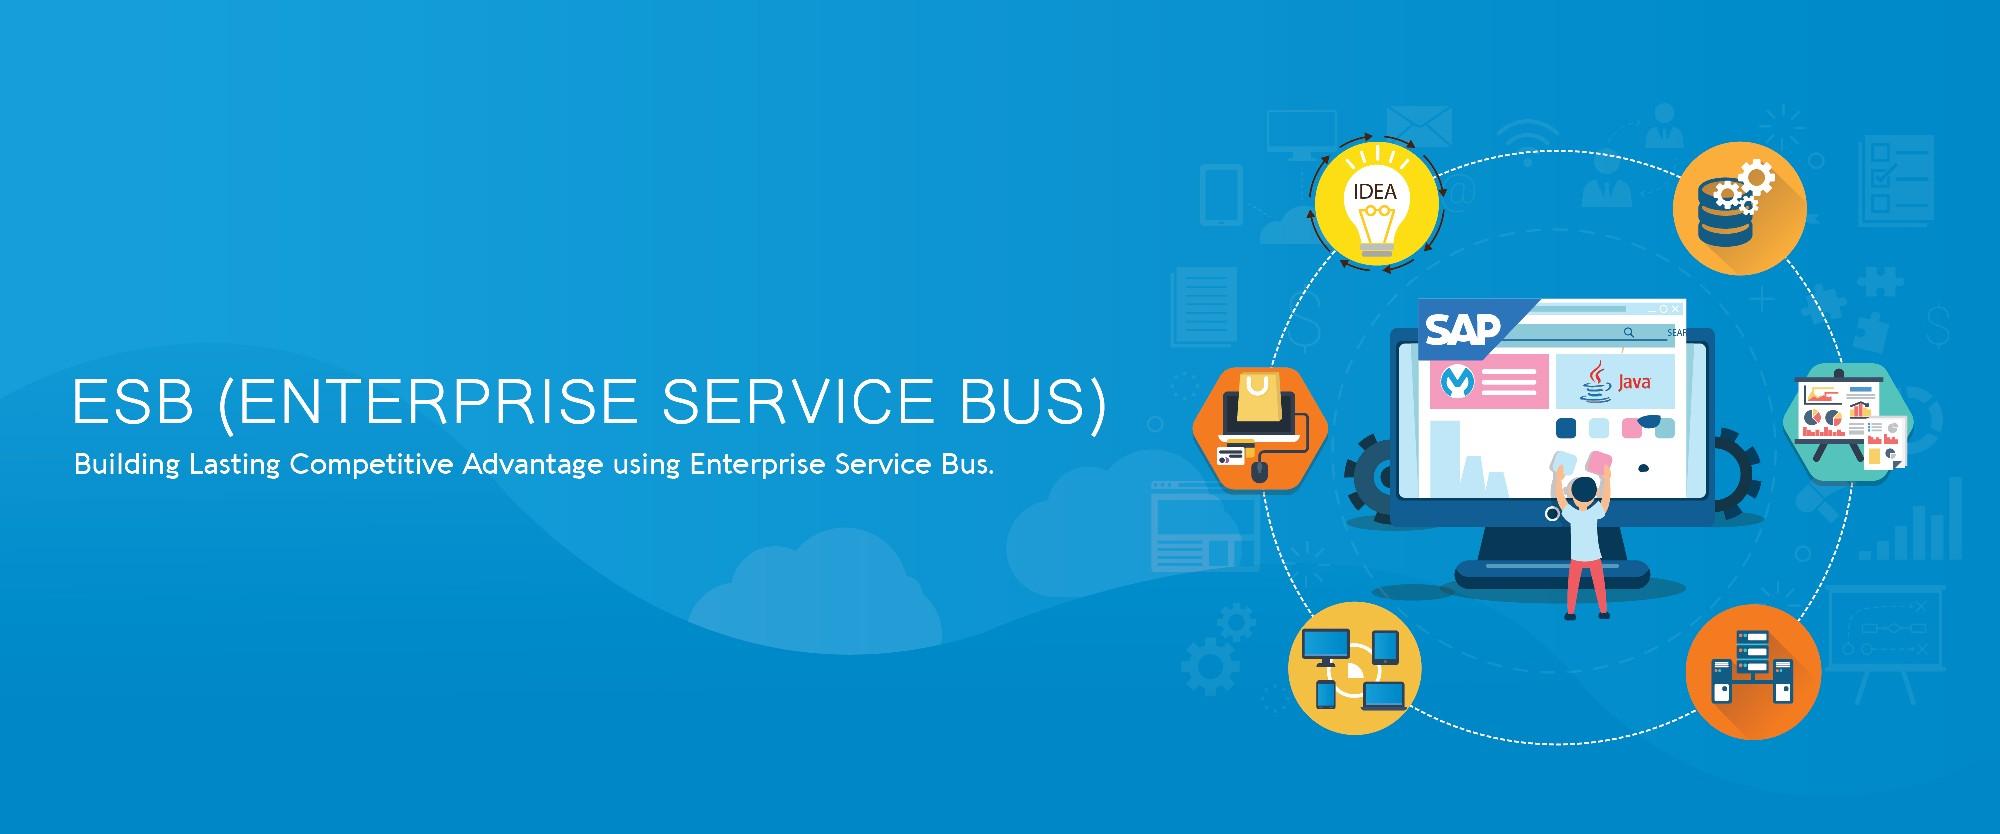 2.ESB (Enterprise Service Bus)-01